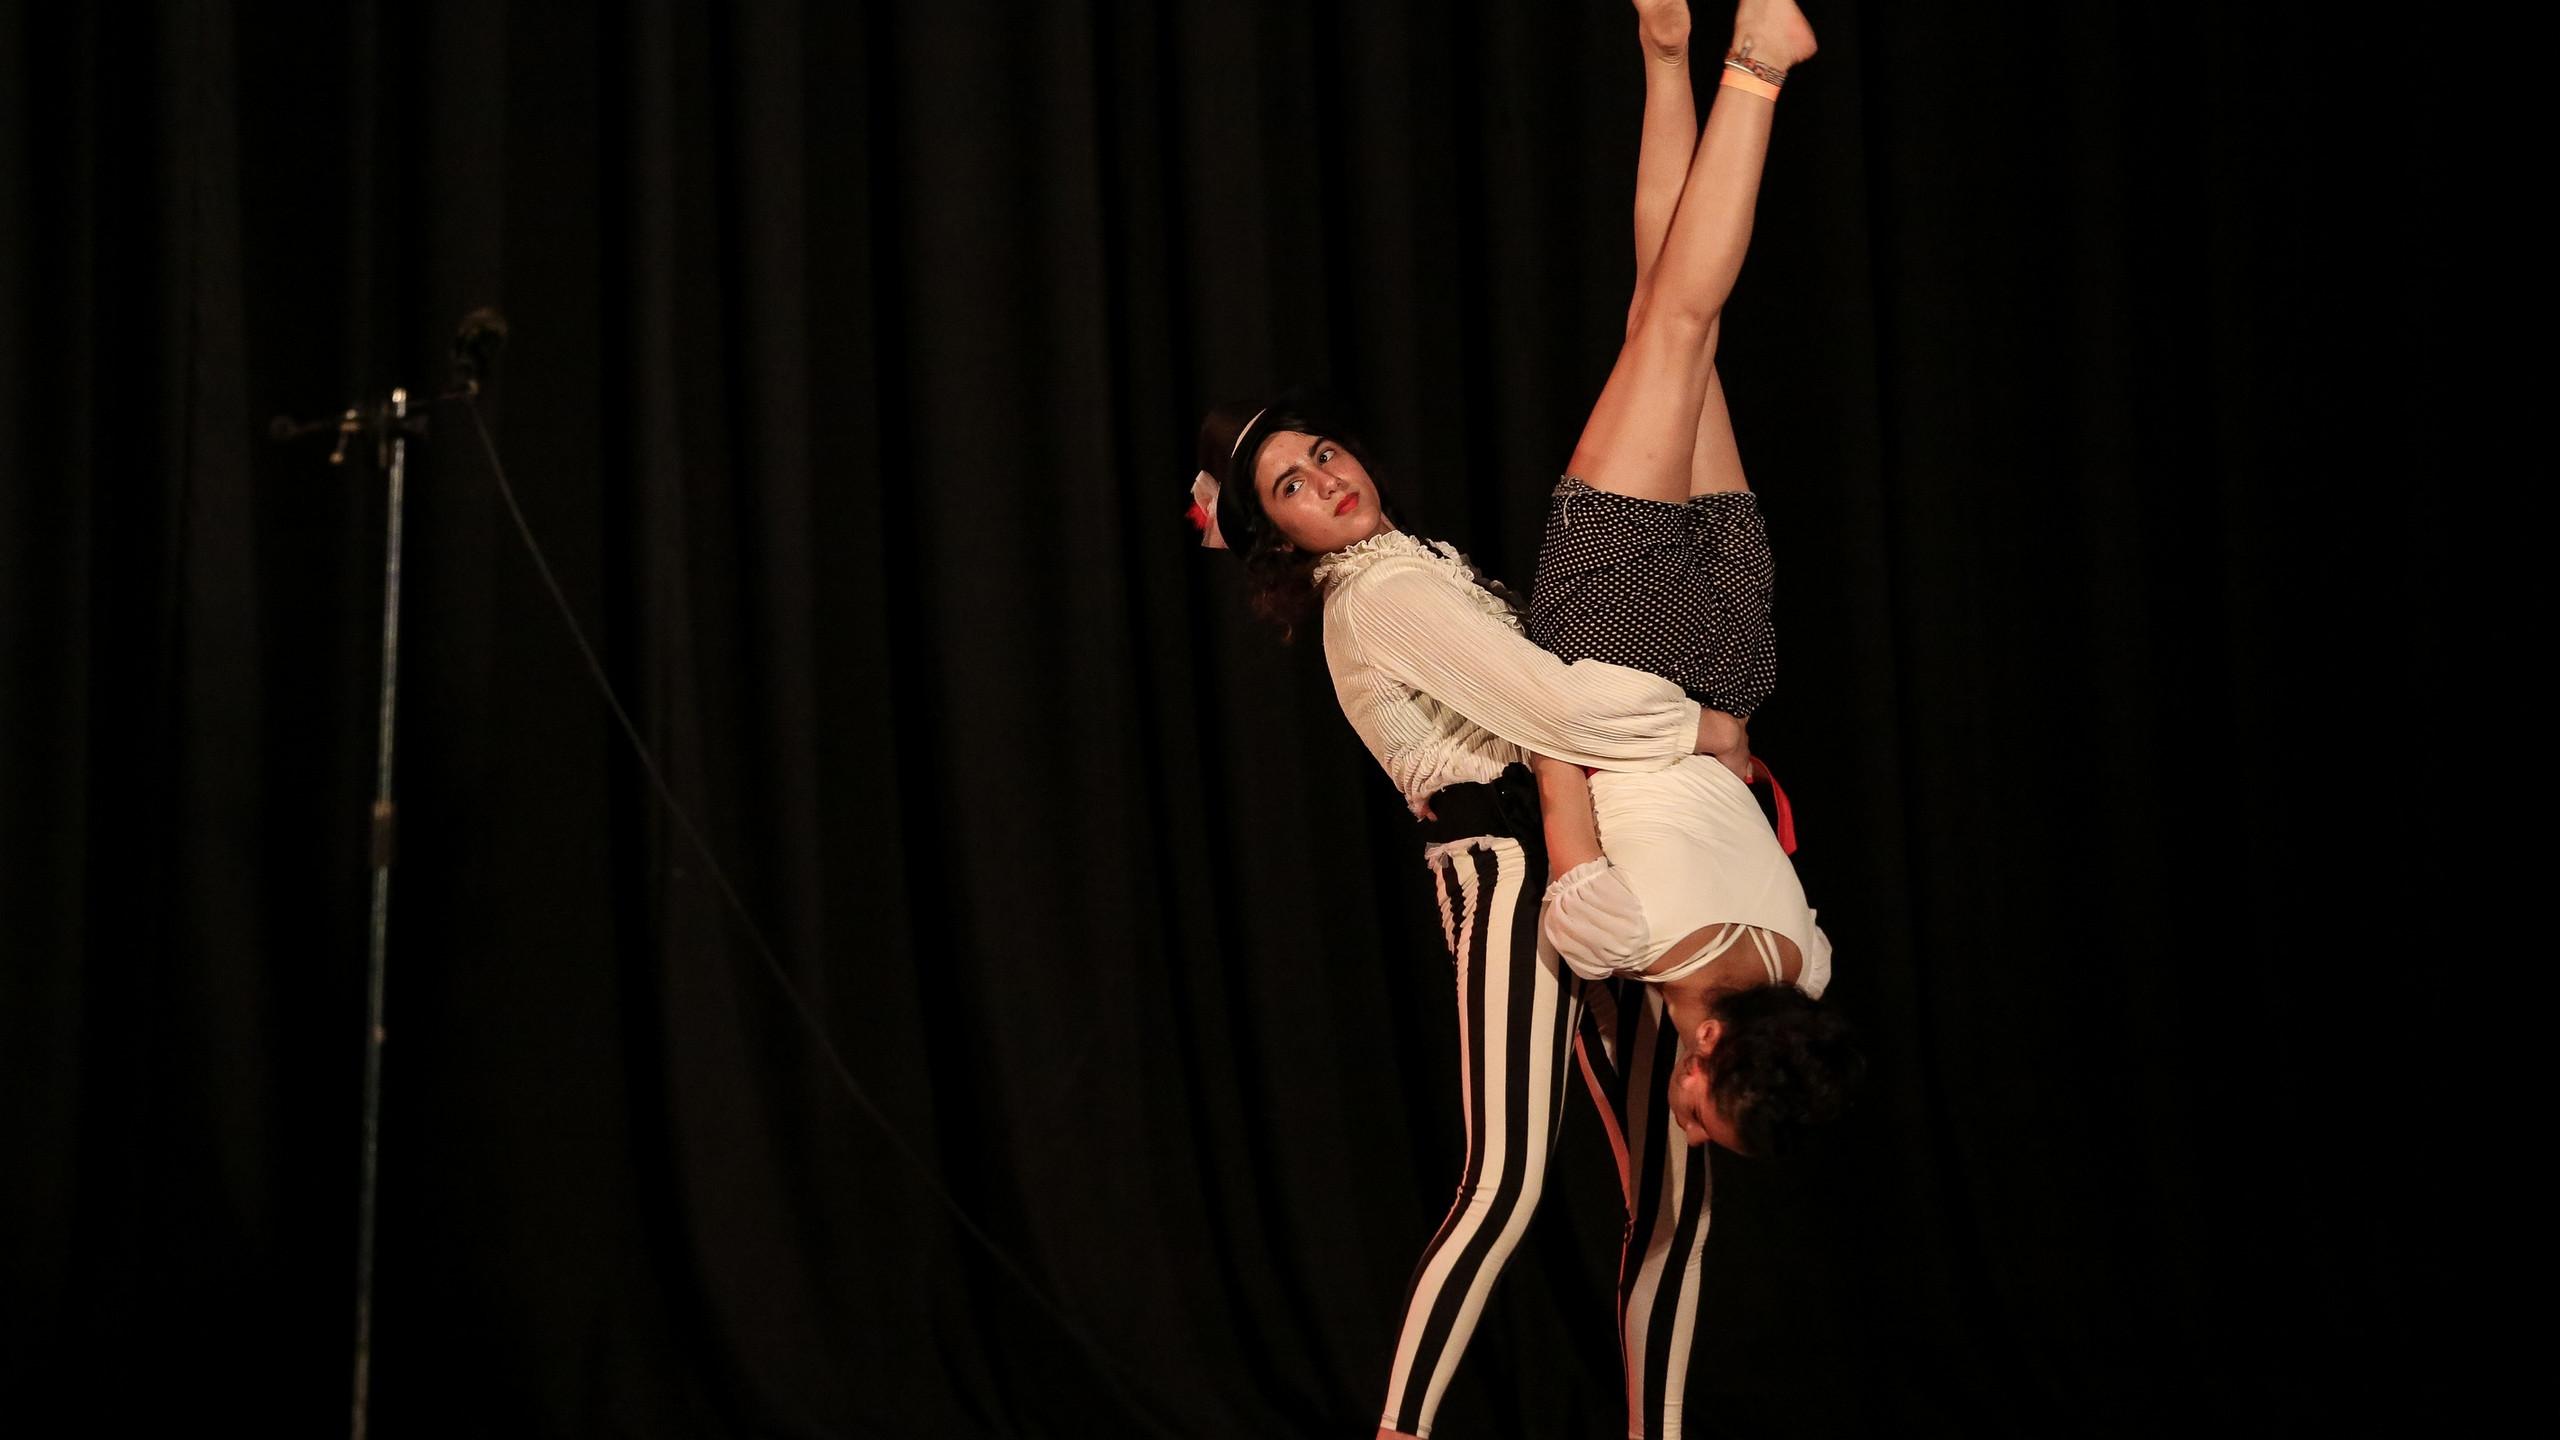 International Circus Convention 2019